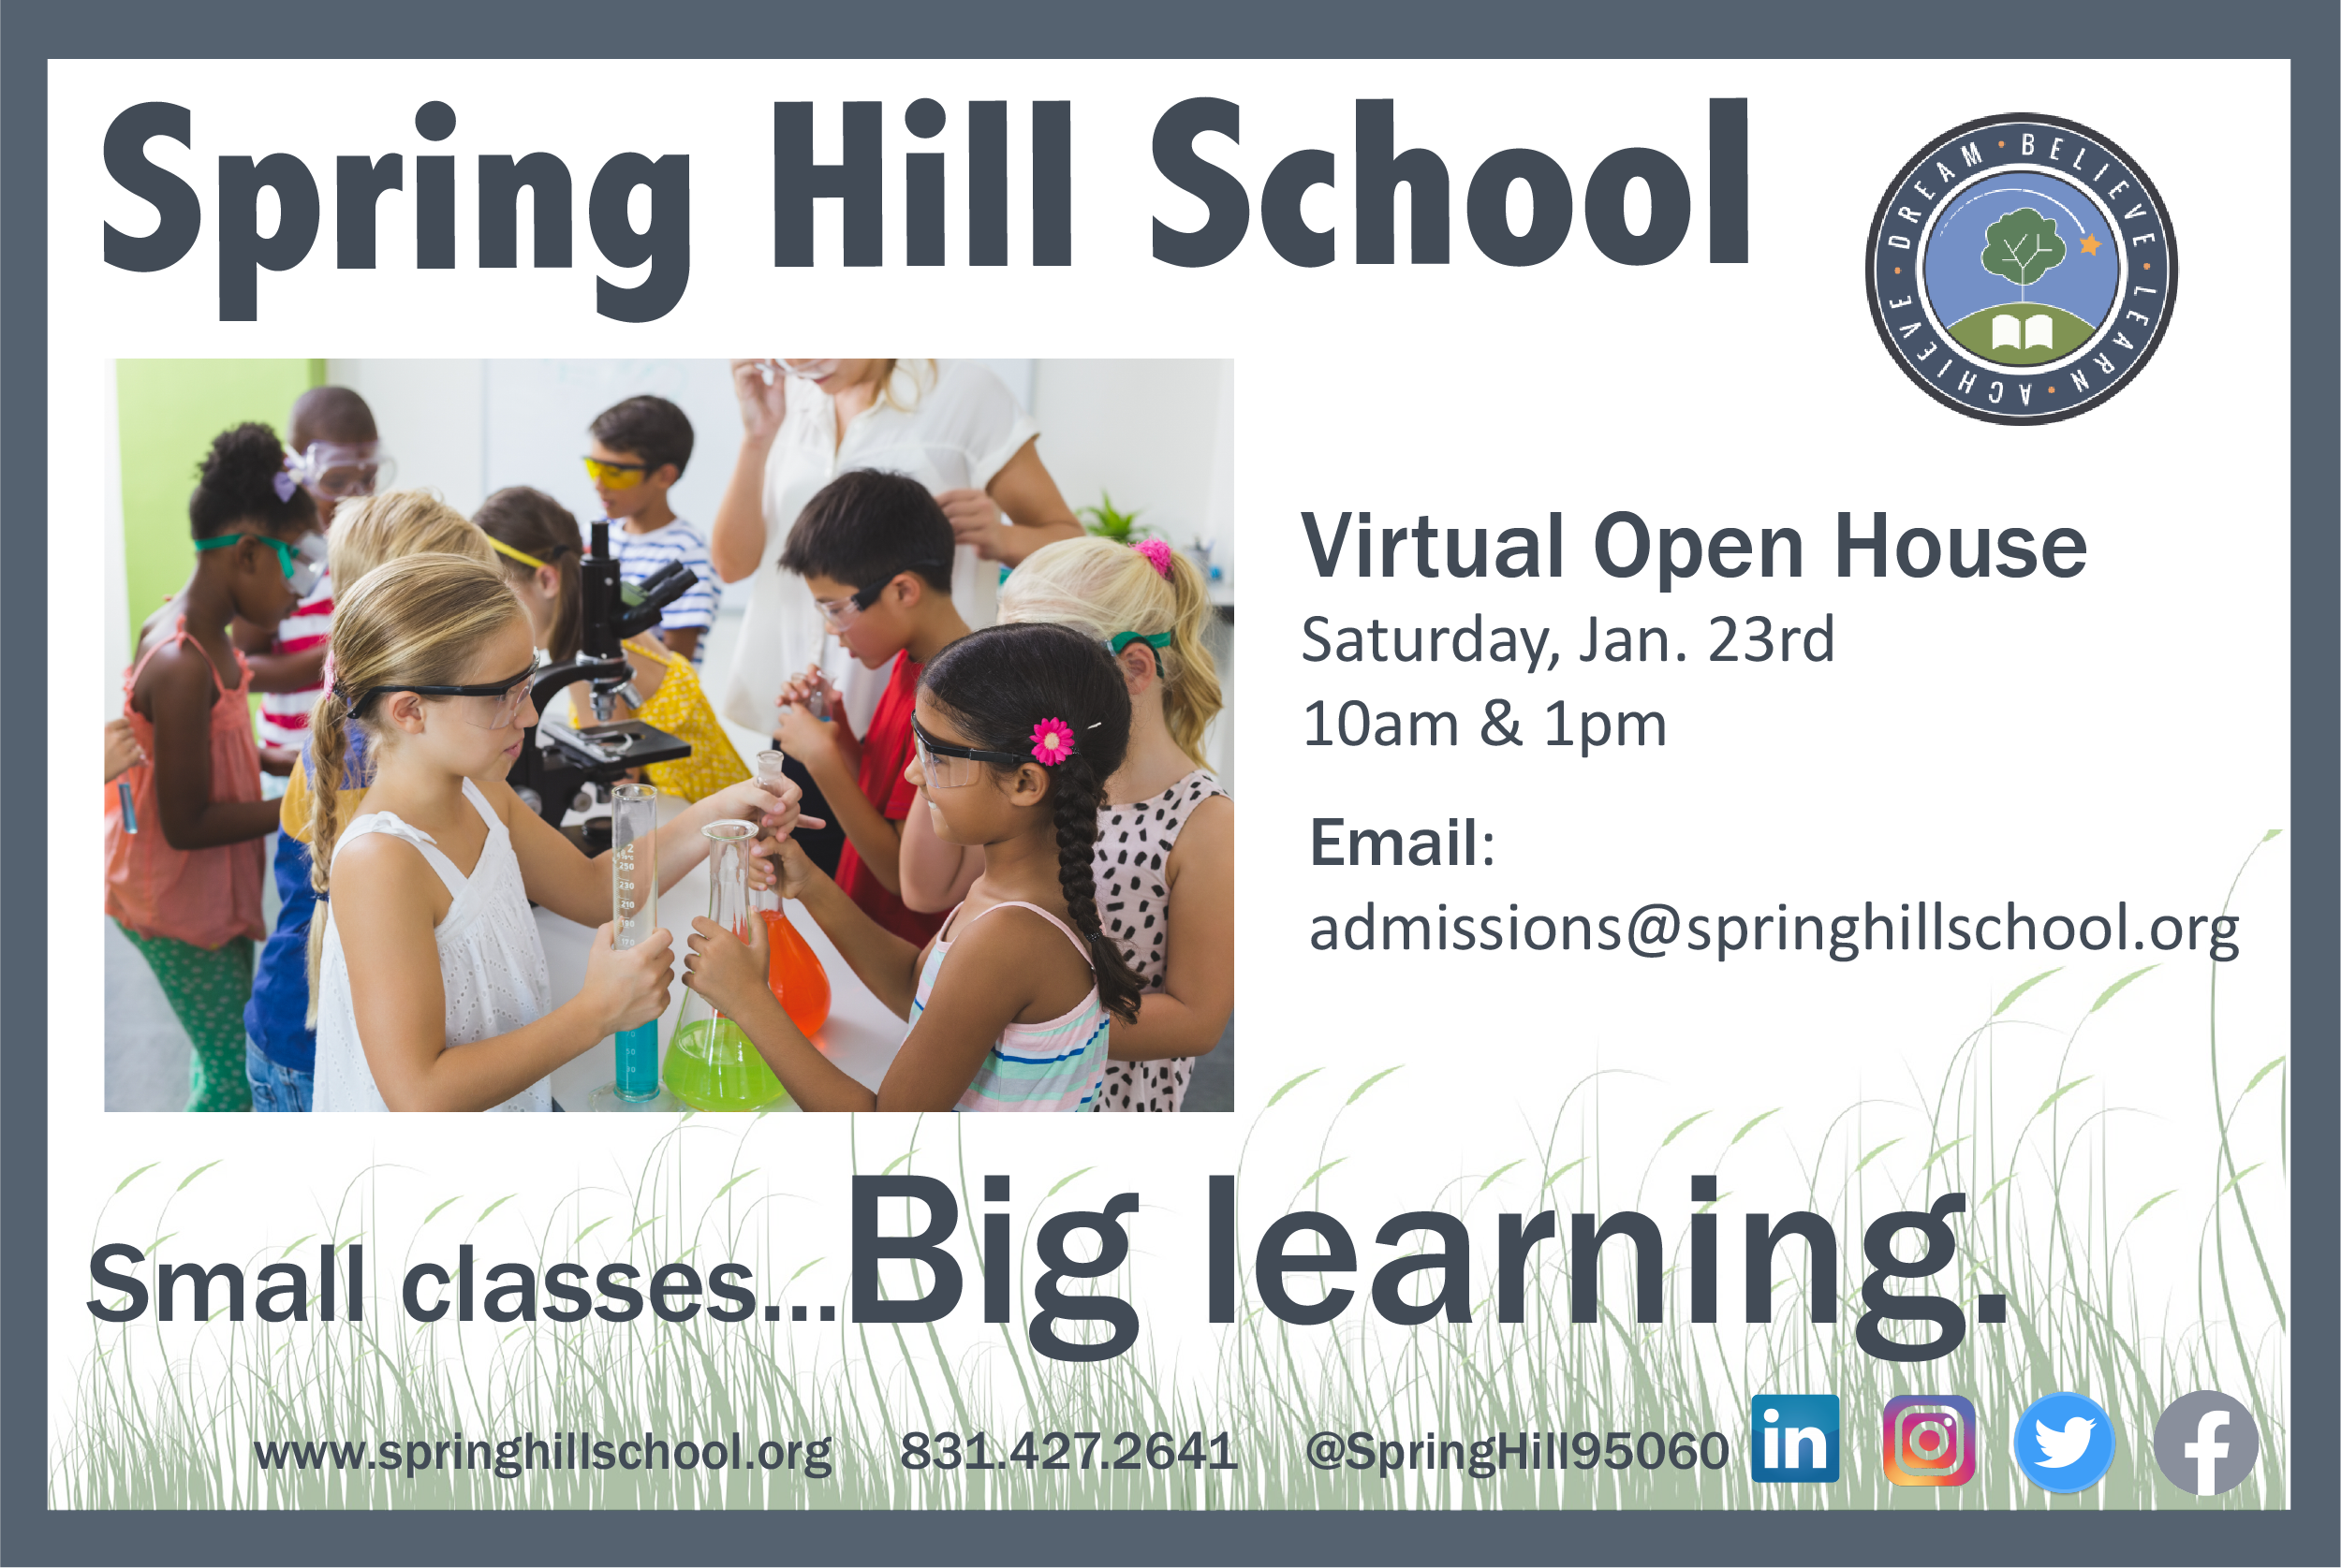 Spring Hill SChool Virtual Open House